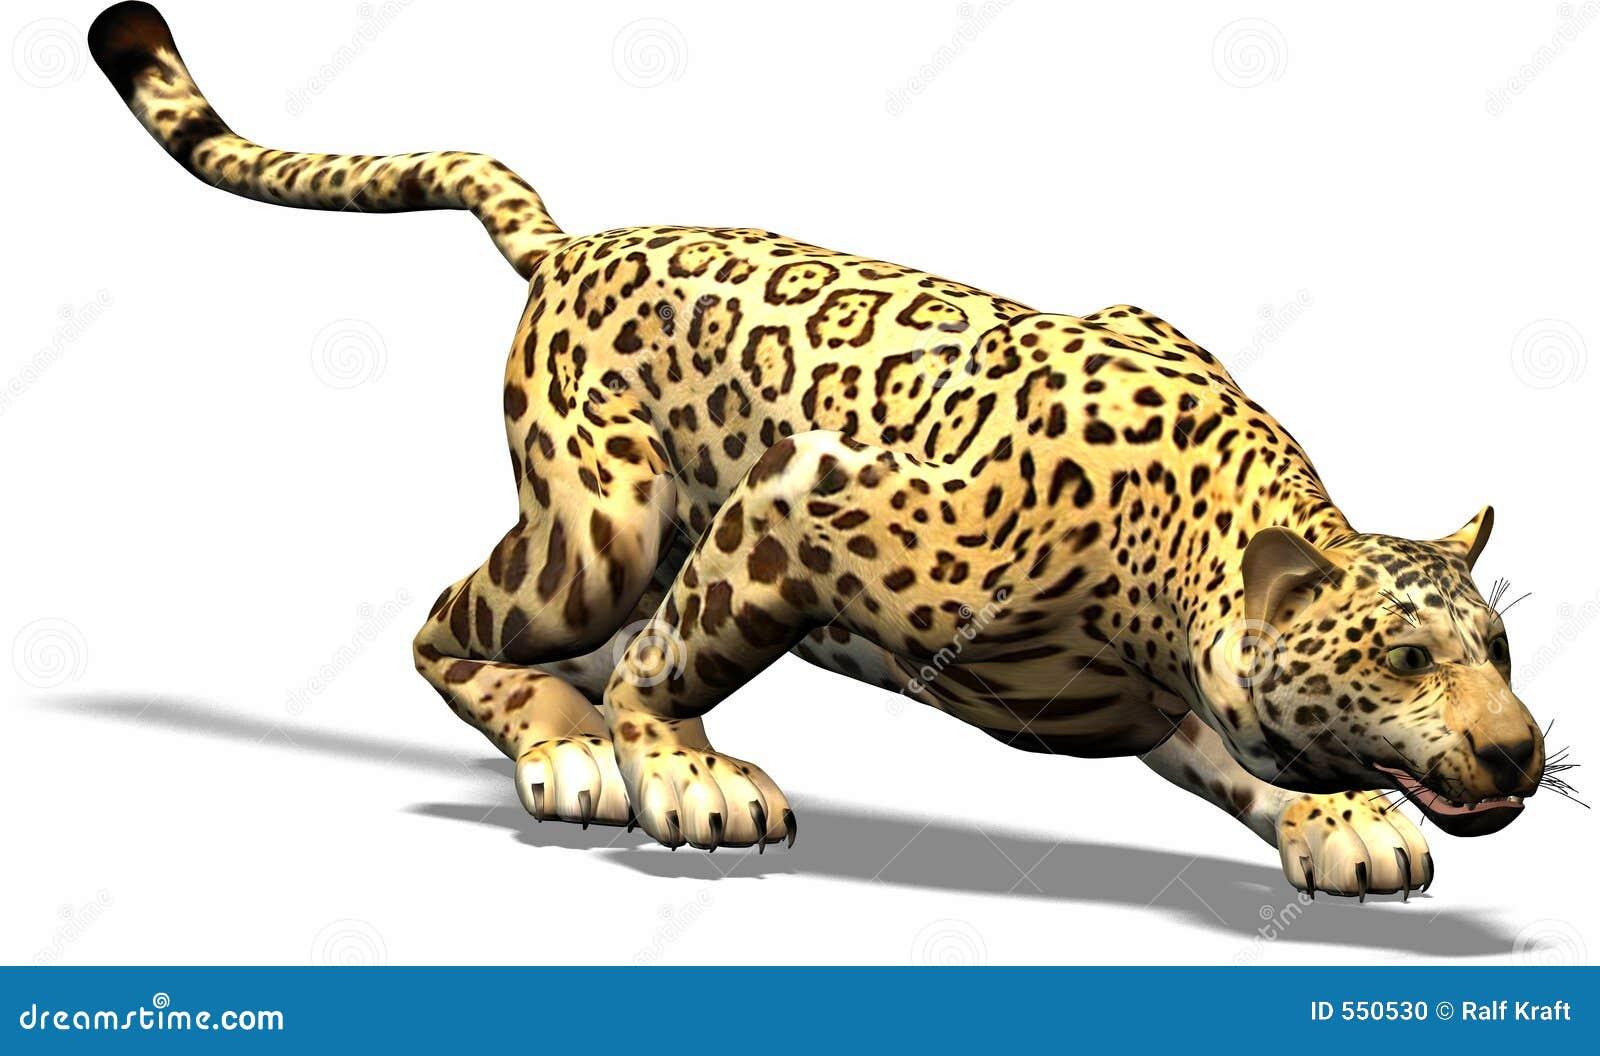 jaguar afrika with Stock Foto Jaguar Op De Jacht Image550530 on Leoparden Alles Ueber Die Stolzen Raeuber together with Fennek as well Animal Of Week Amur Leopard in addition 574 Kamel Dromedar Unterschied as well King Cheetah 357525586.